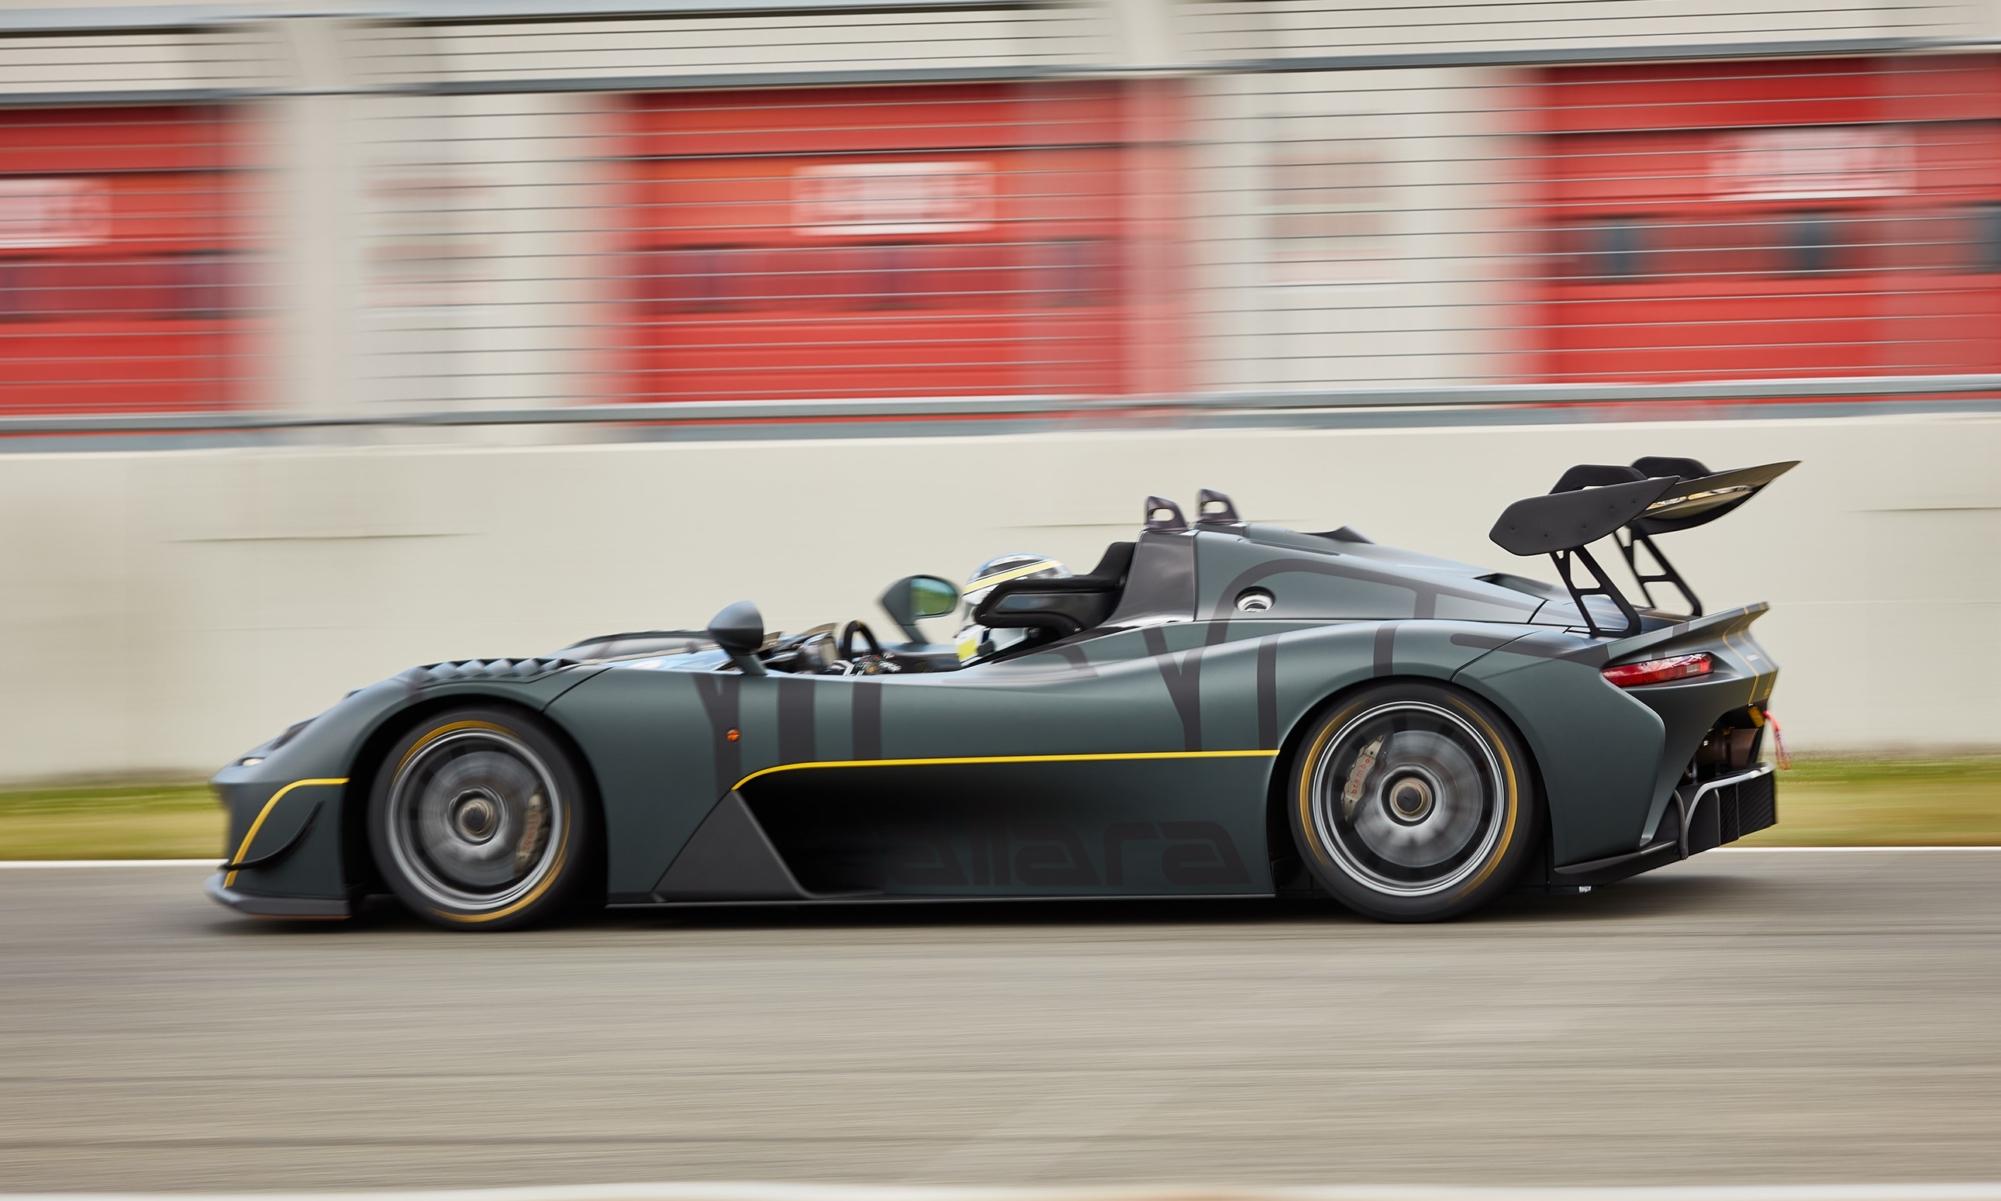 Dallara Stradale EXP side